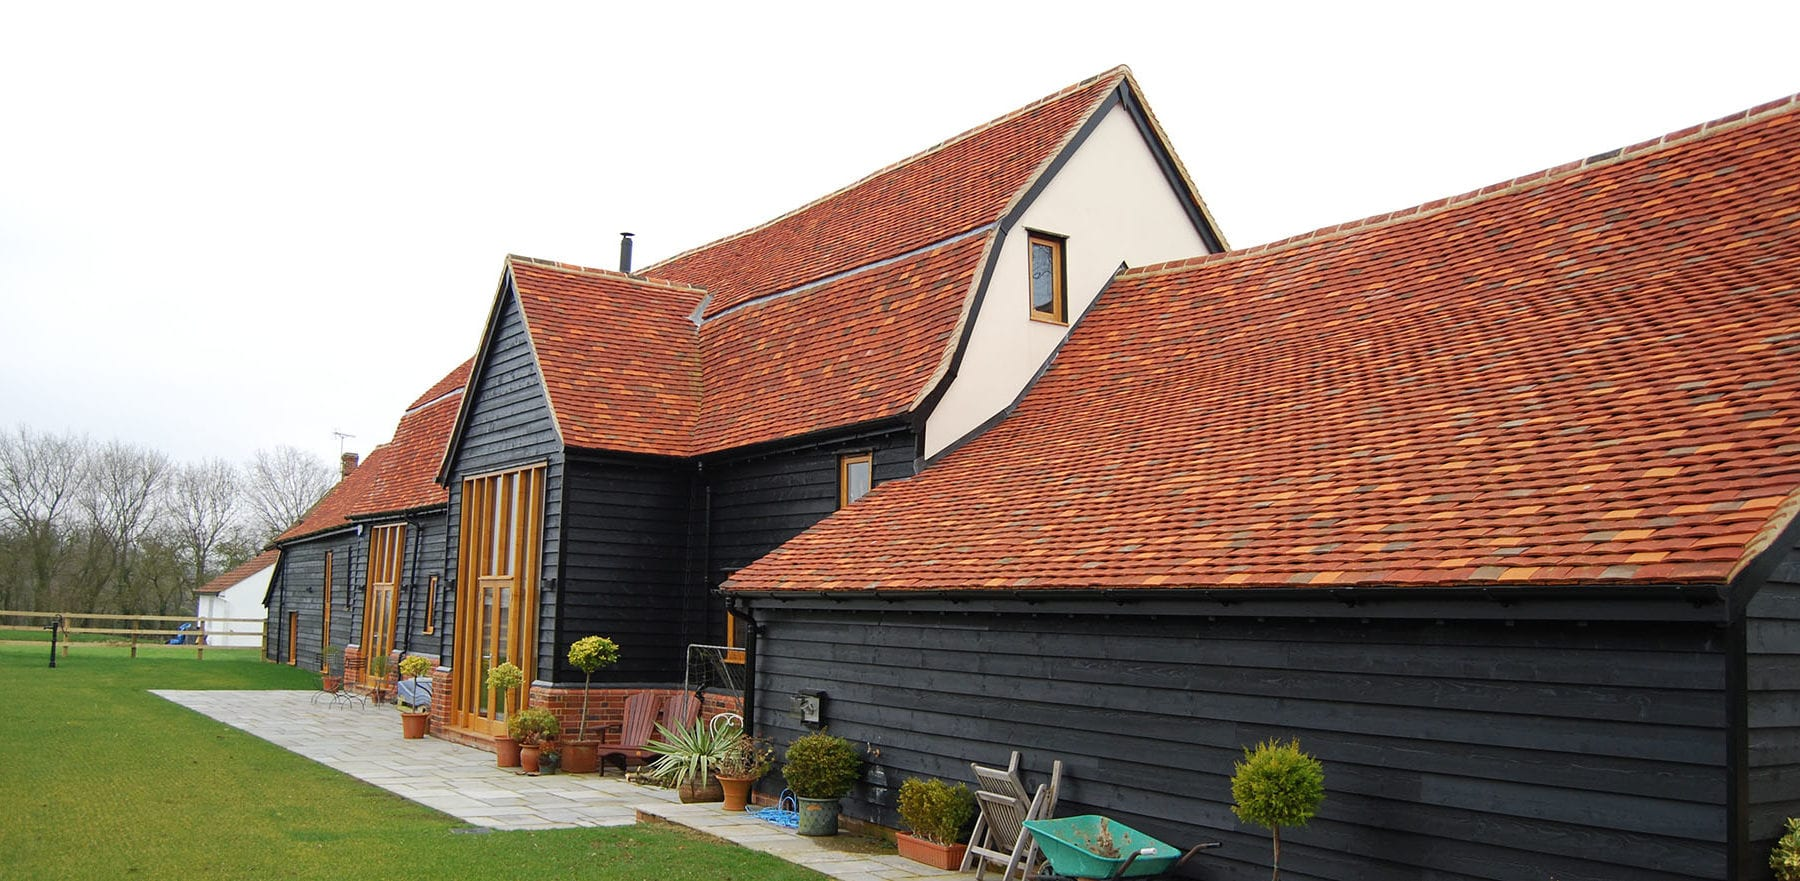 Lifestiles - Handmade Multi Clay Roof Tiles - Ford End, England 4